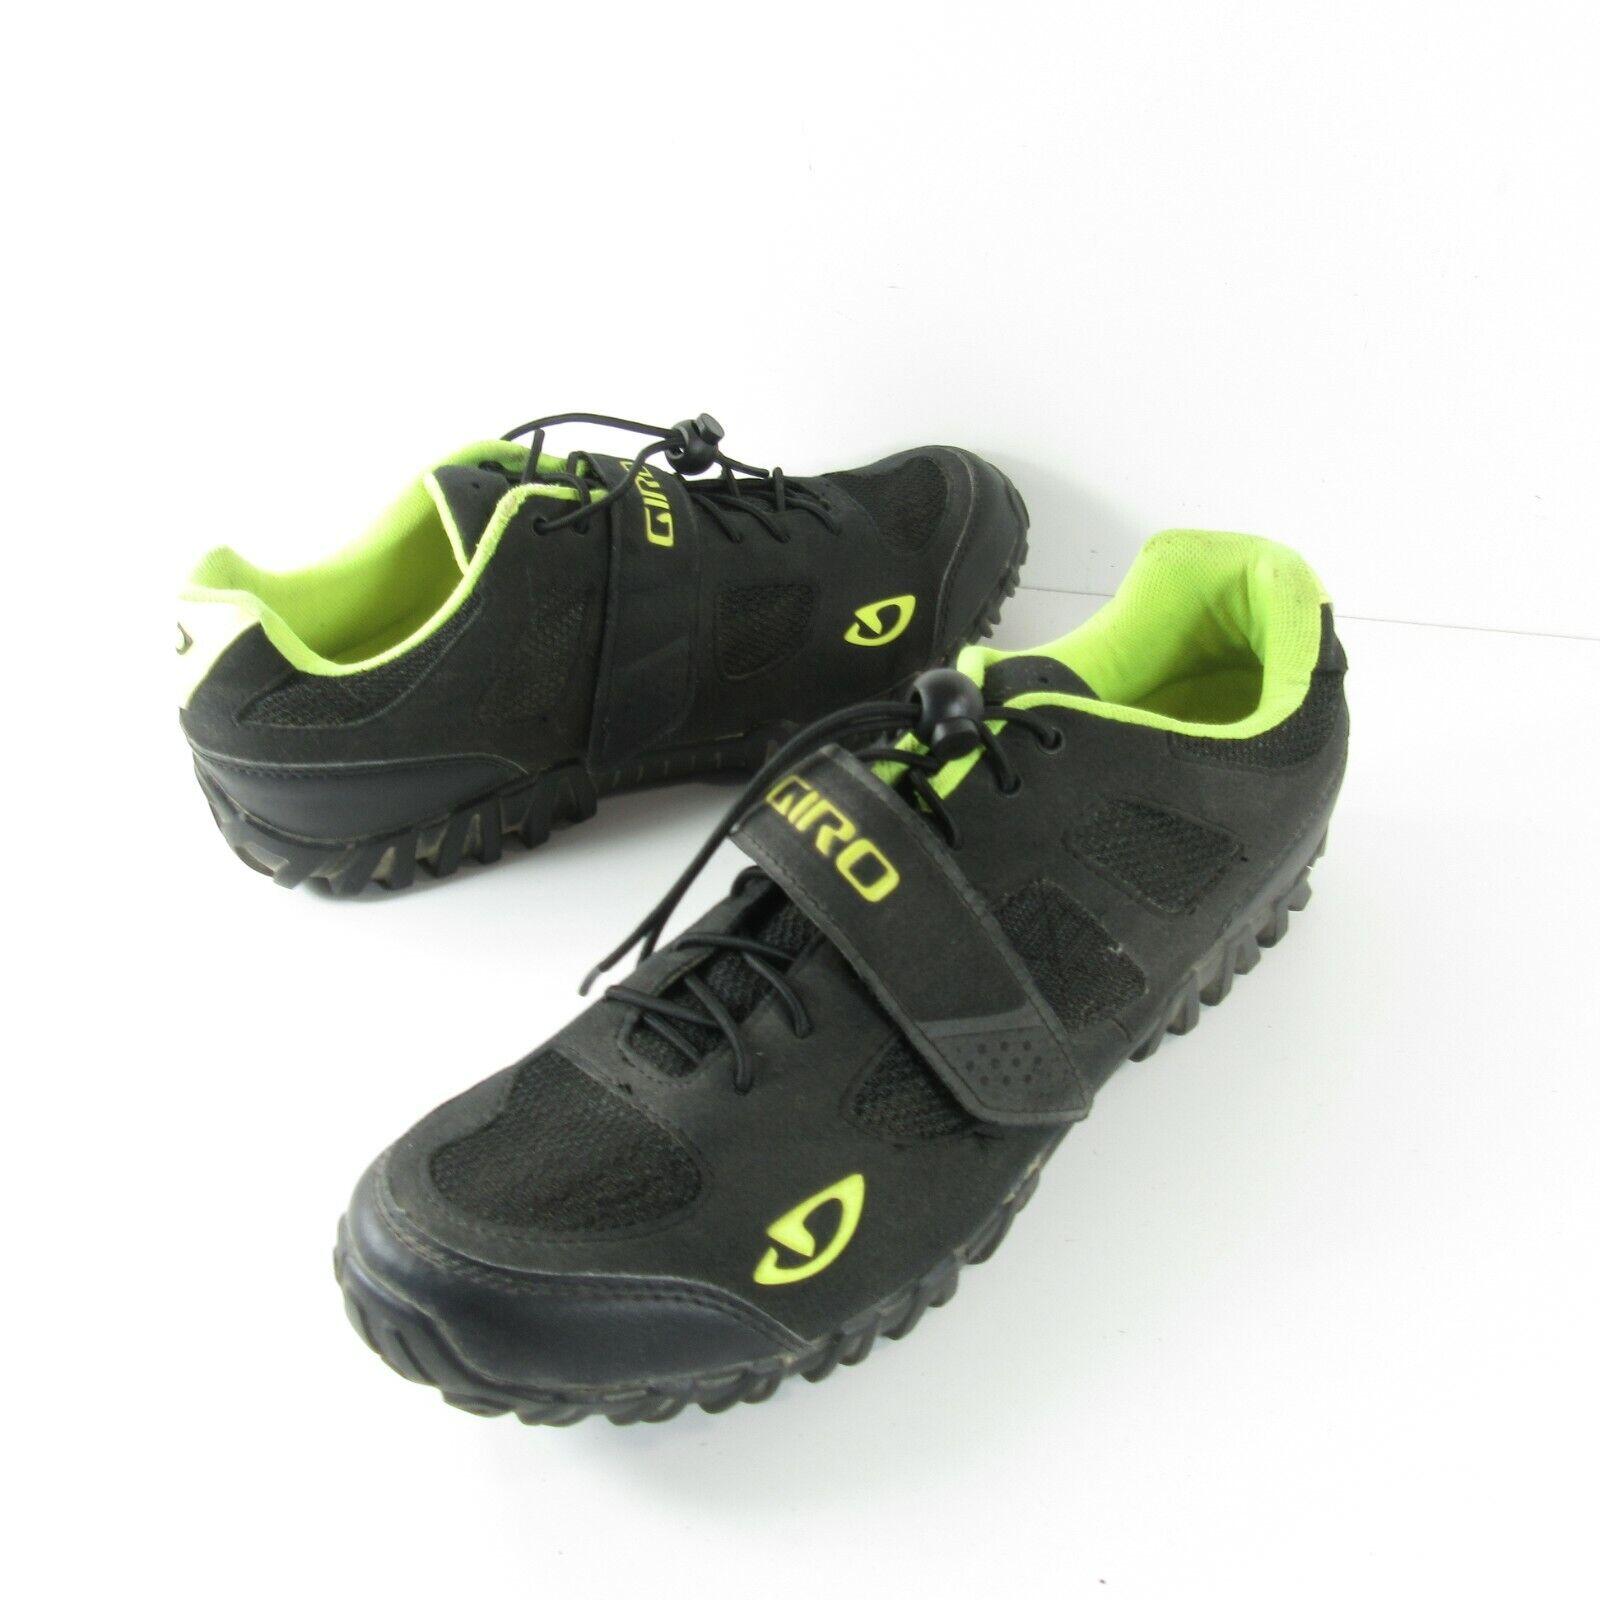 Grave basura dedo índice  Nike ACG Brown & Black Cycling Mountain Bike Shoes for sale online | eBay